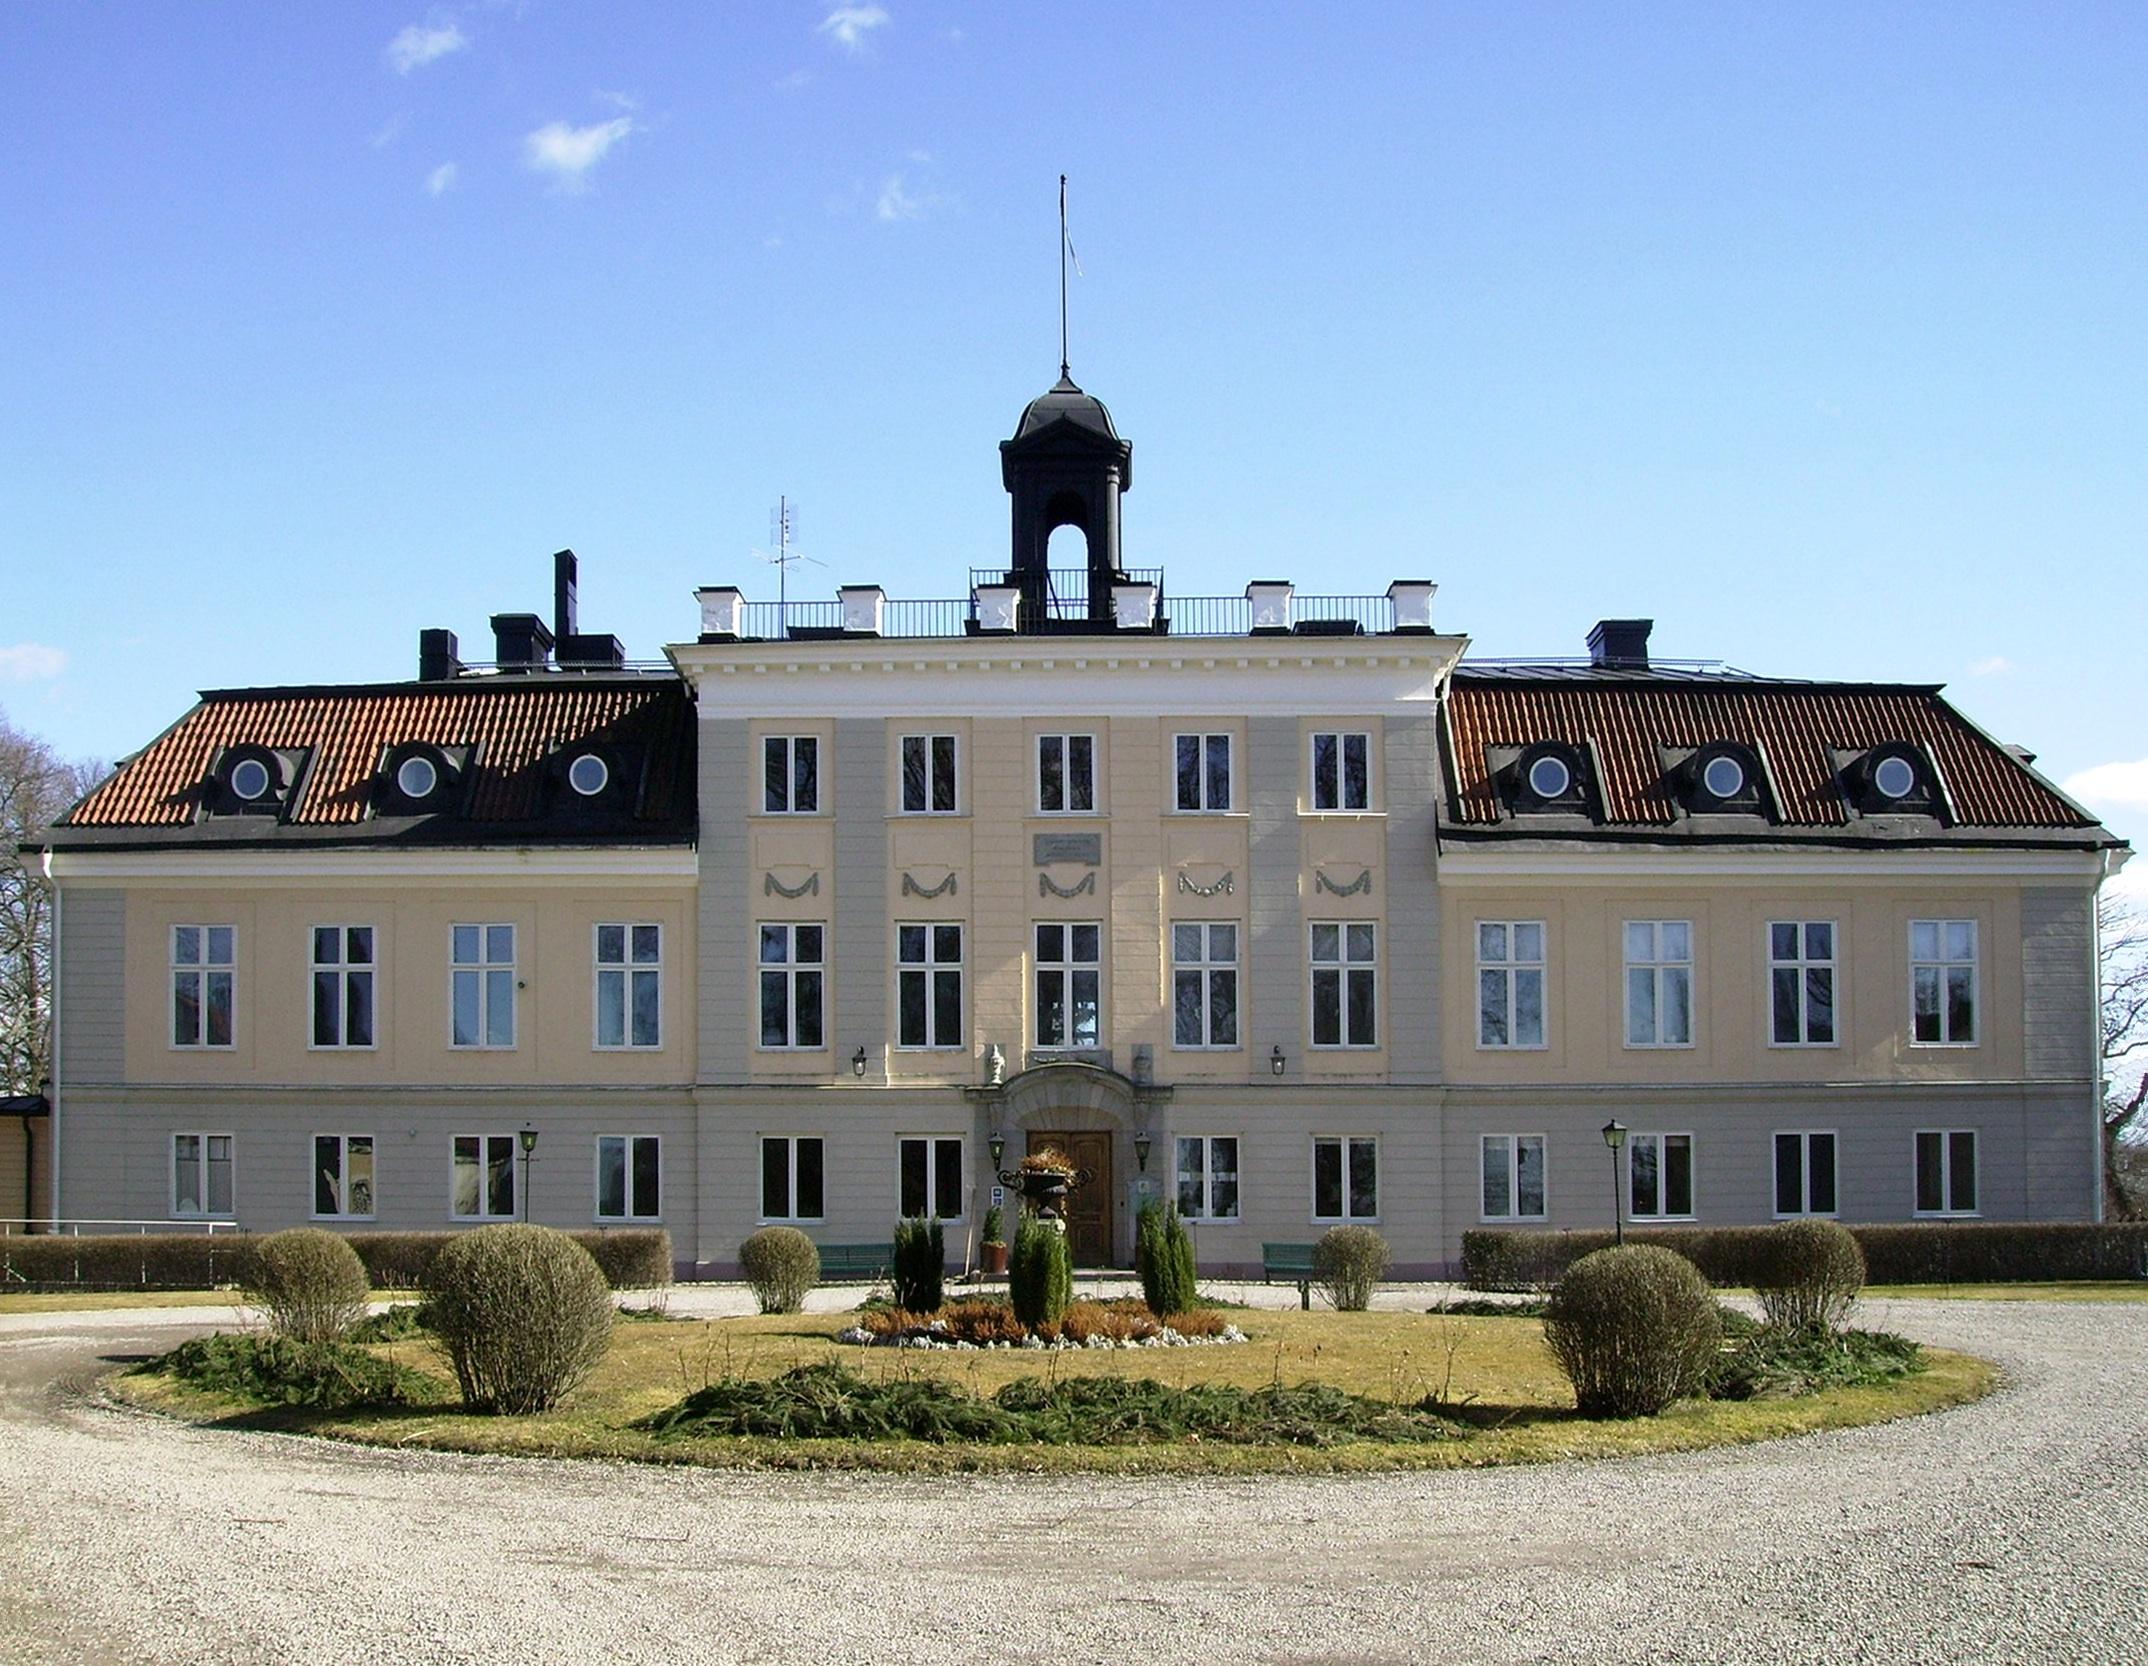 Massage gnesta dating in sweden